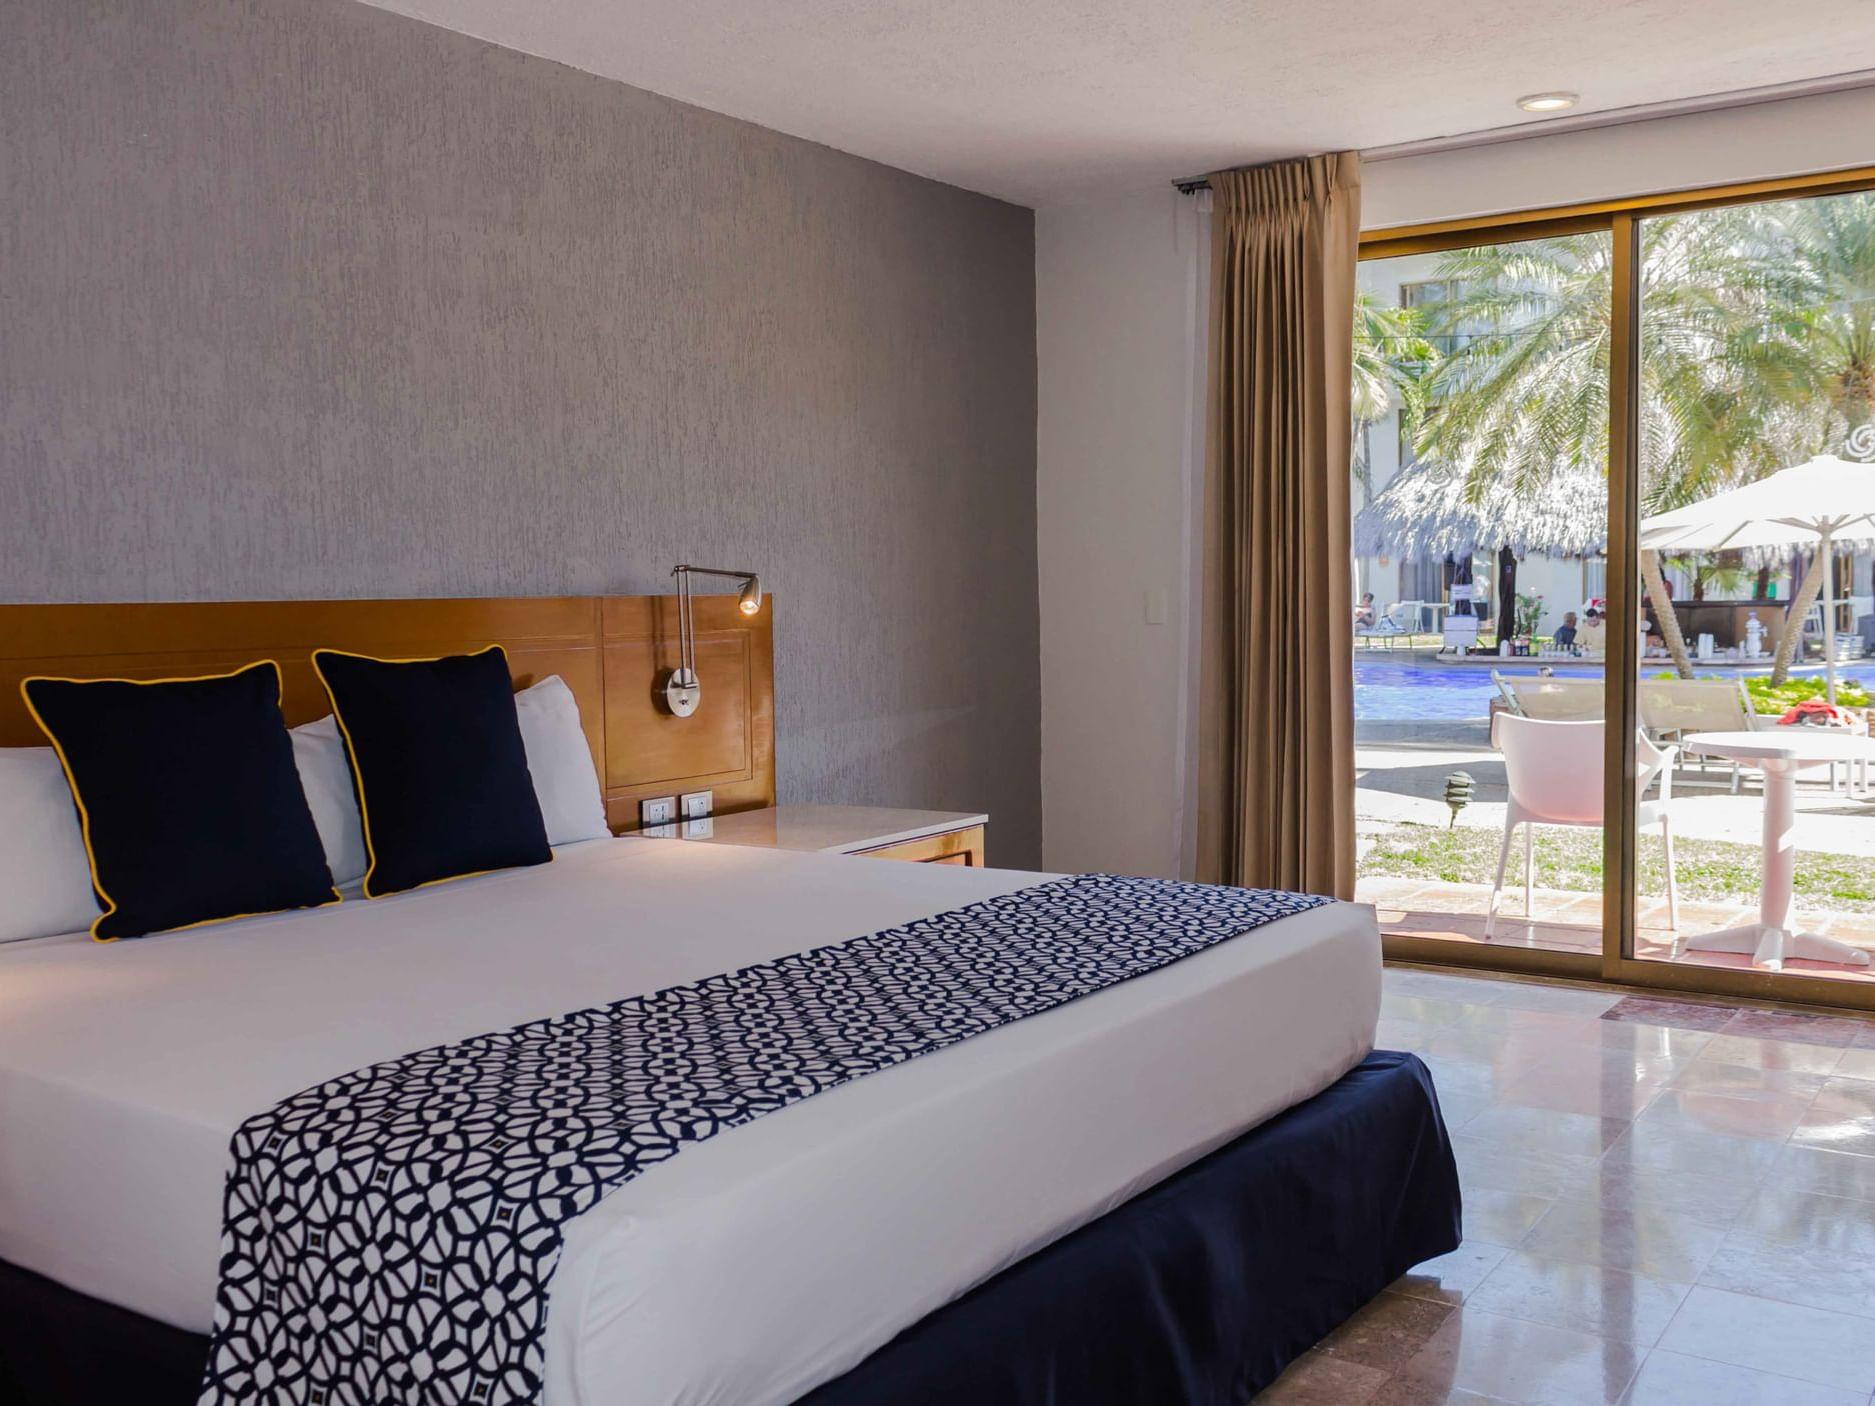 King Room in Plaza Pelicanos Club Beach Resort